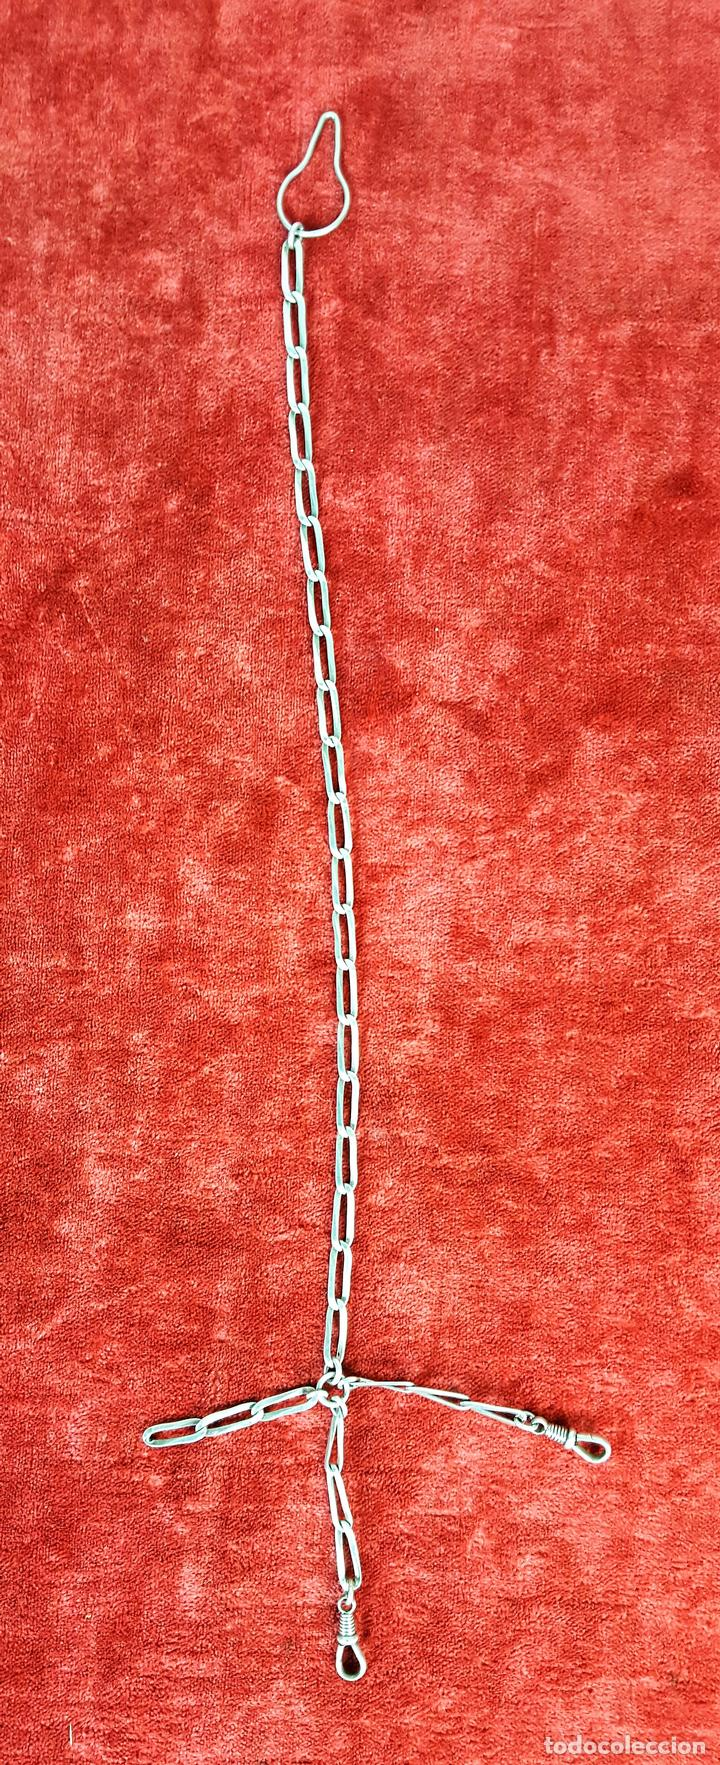 CADENA LEONTINA. METAL PLATEADO. ESPAÑA. PRINC. S. XX (Relojes - Pared Carga Manual)